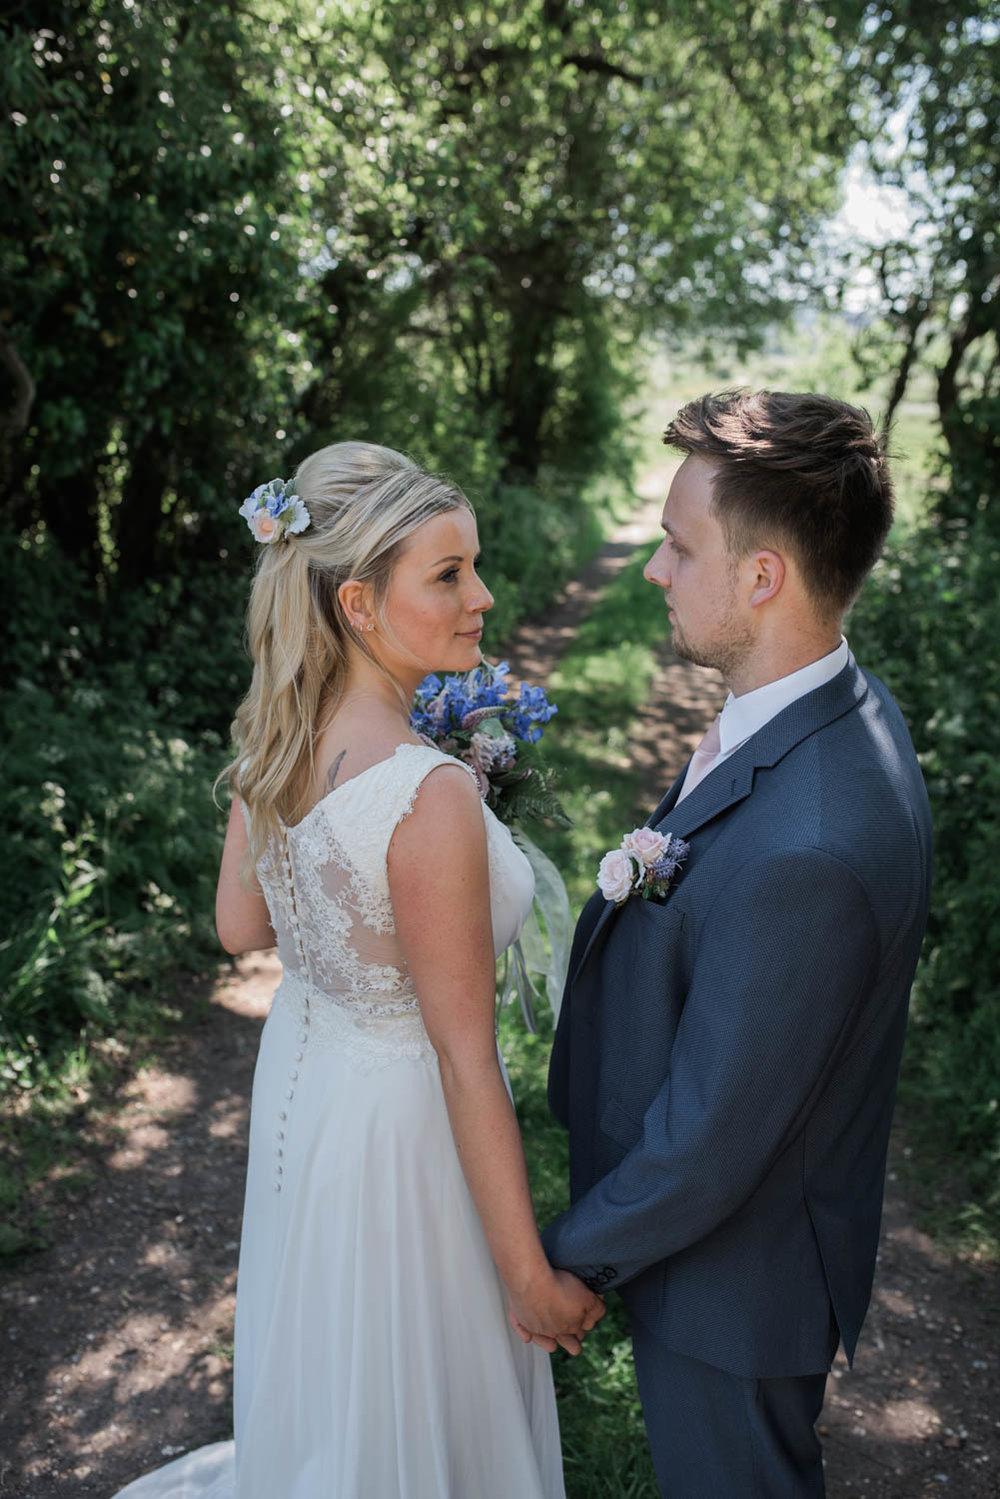 sopley-mill-wedding-phototography-60.jpg